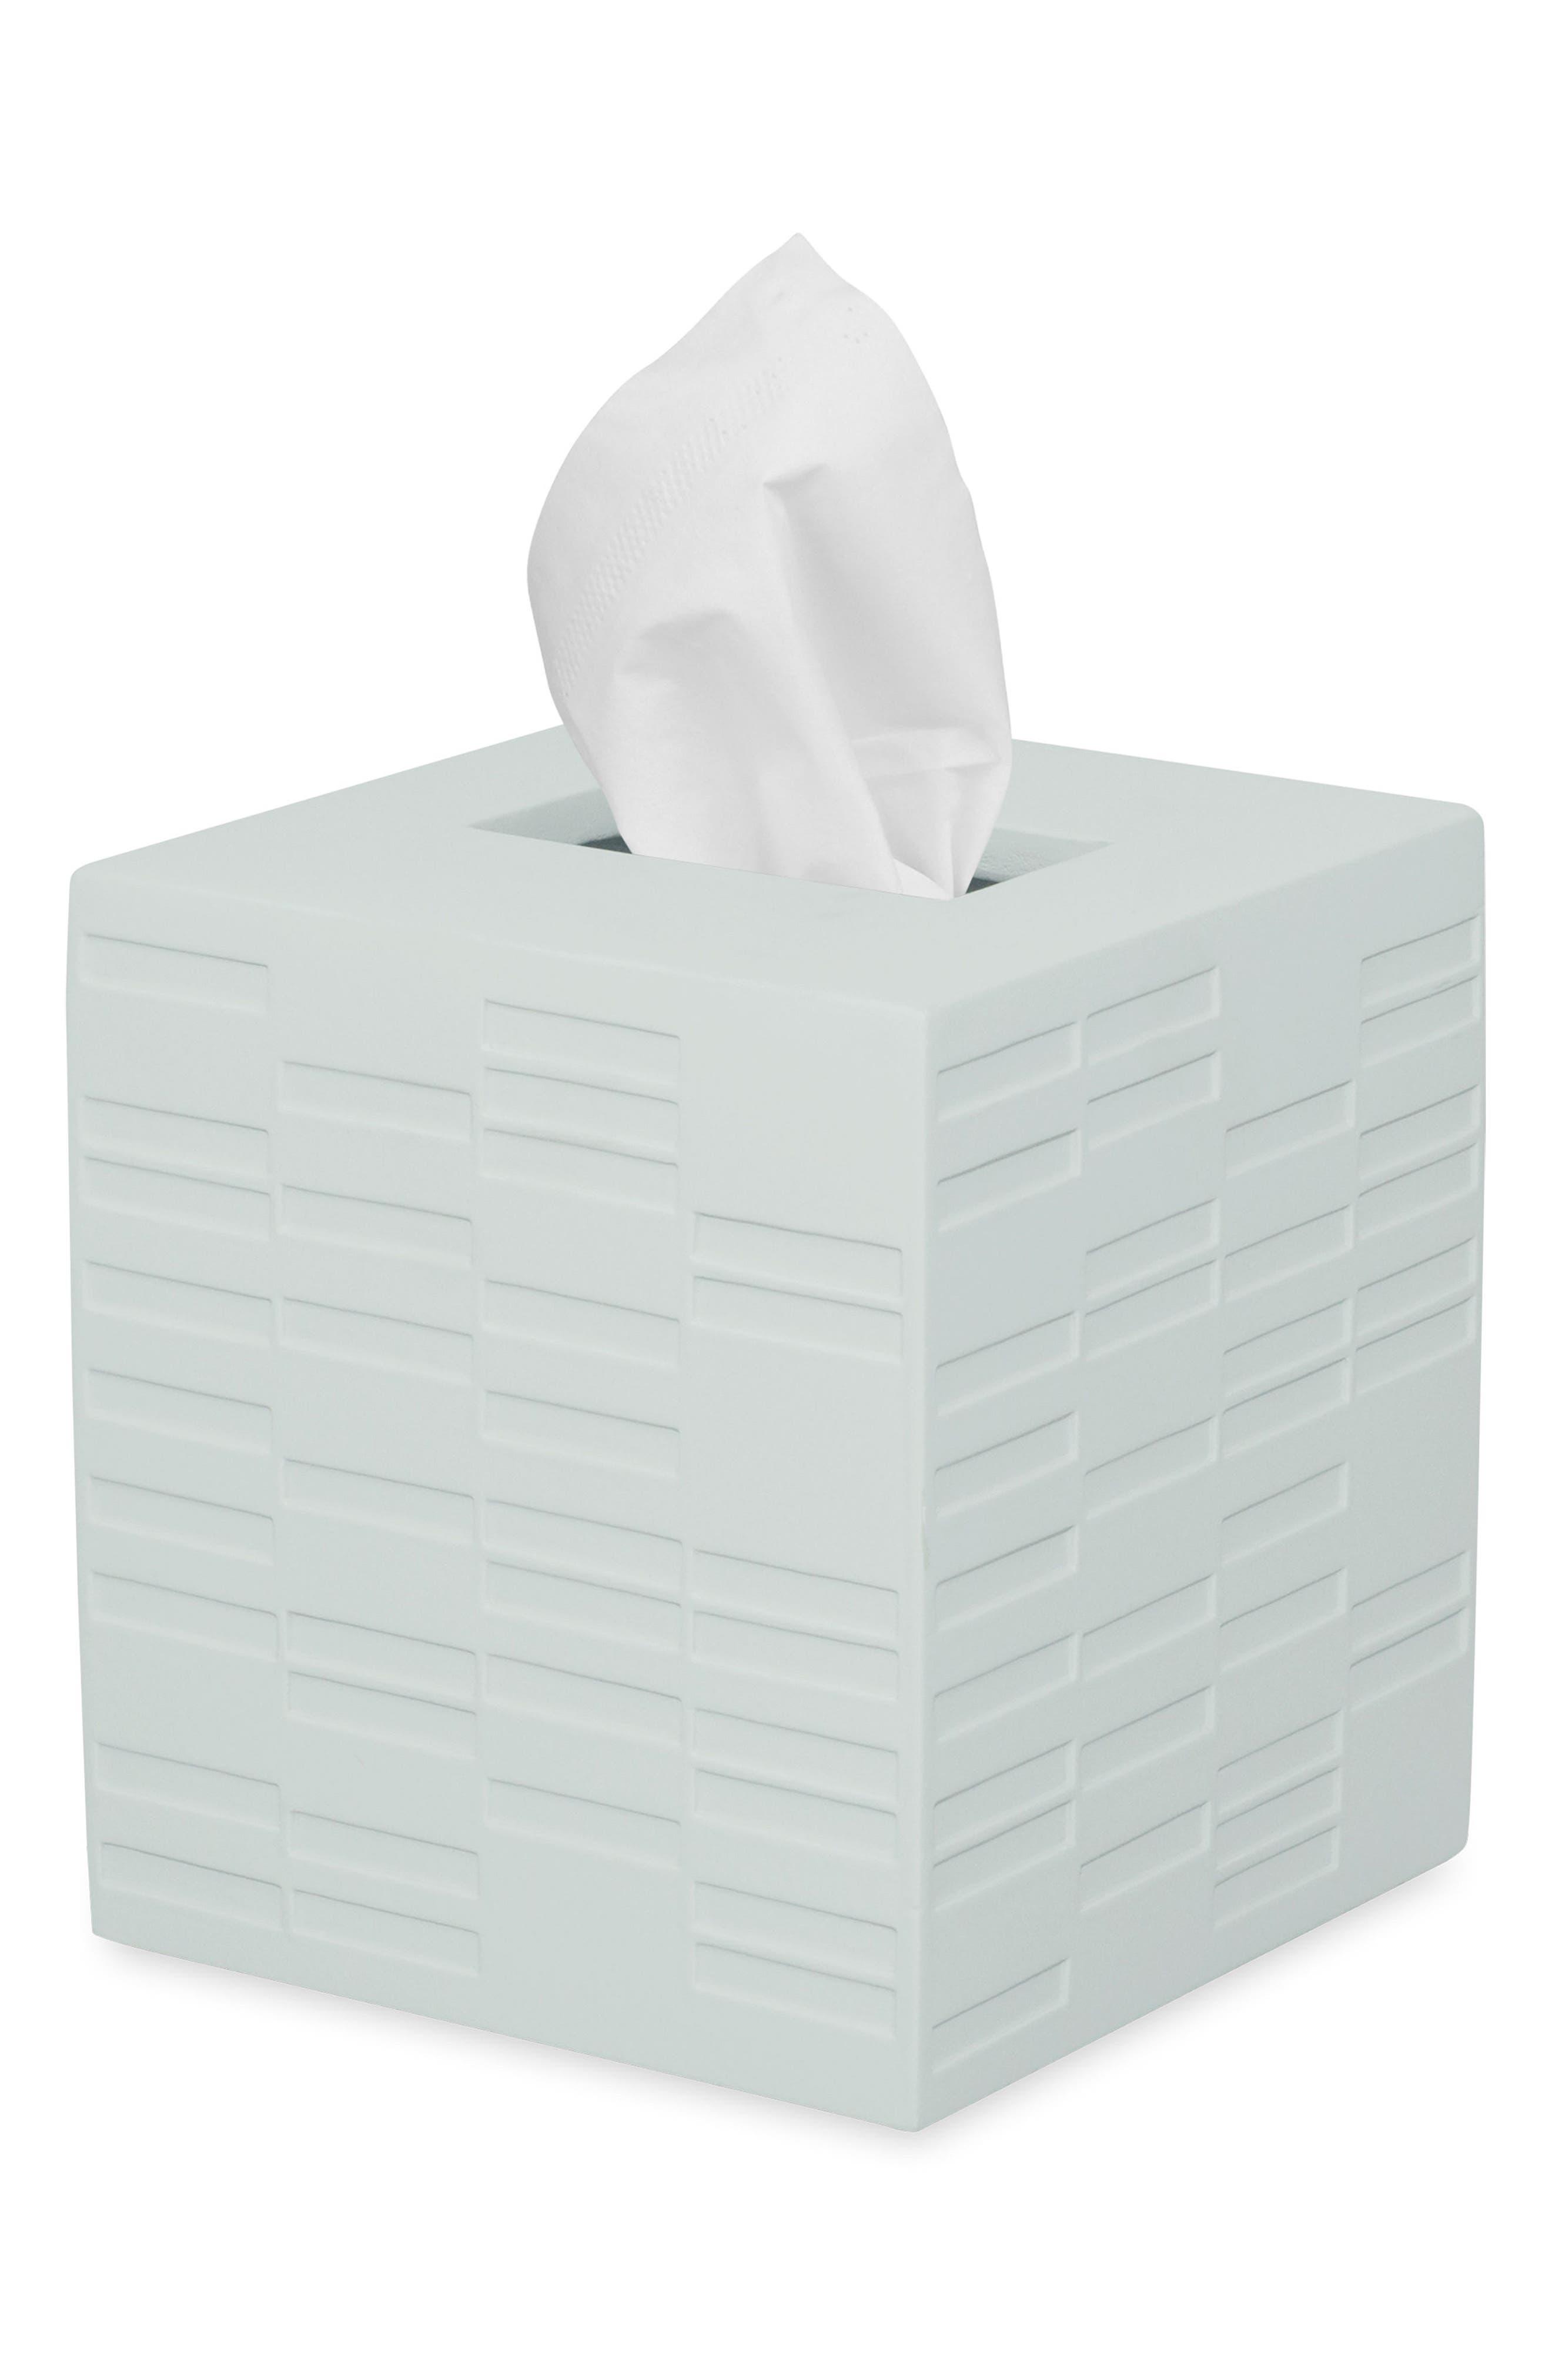 Main Image - DKNY High Rise Tissue Box Cover